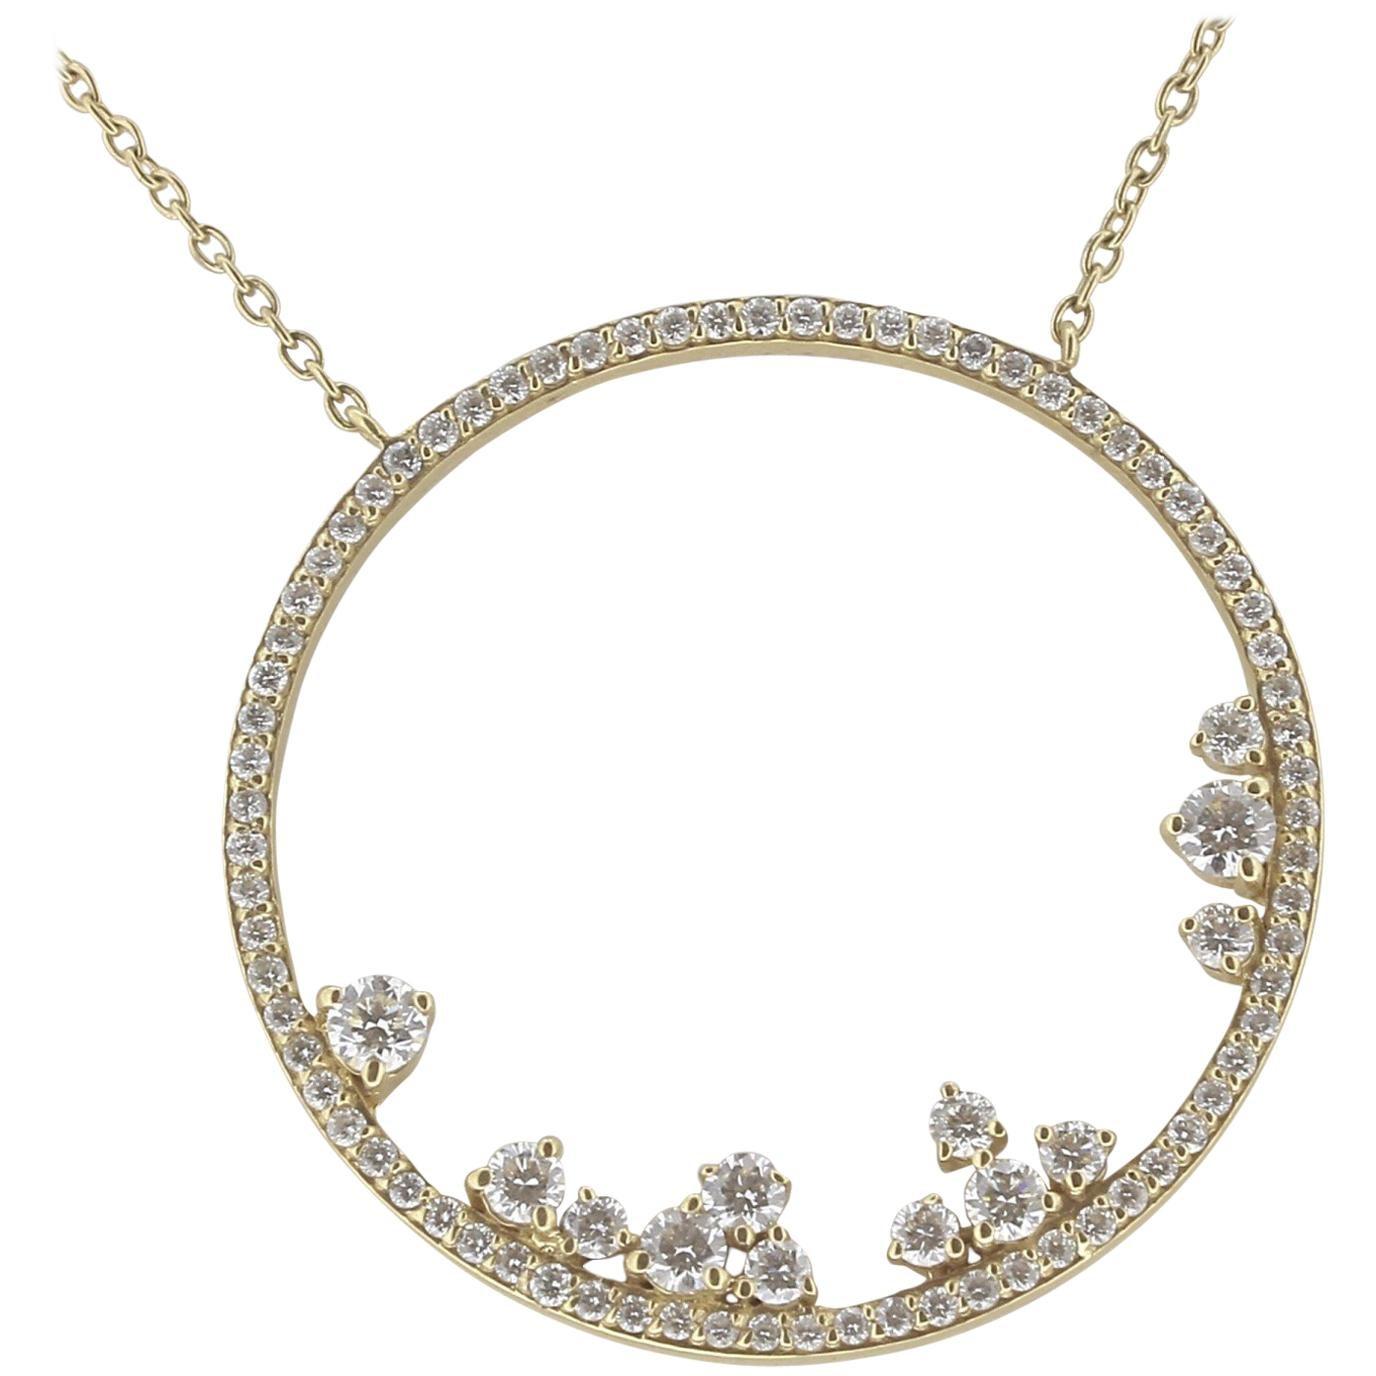 0.82 Carat GVS White Diamond Pendant Necklace 18 Karat Yellow Gold Moon Necklace